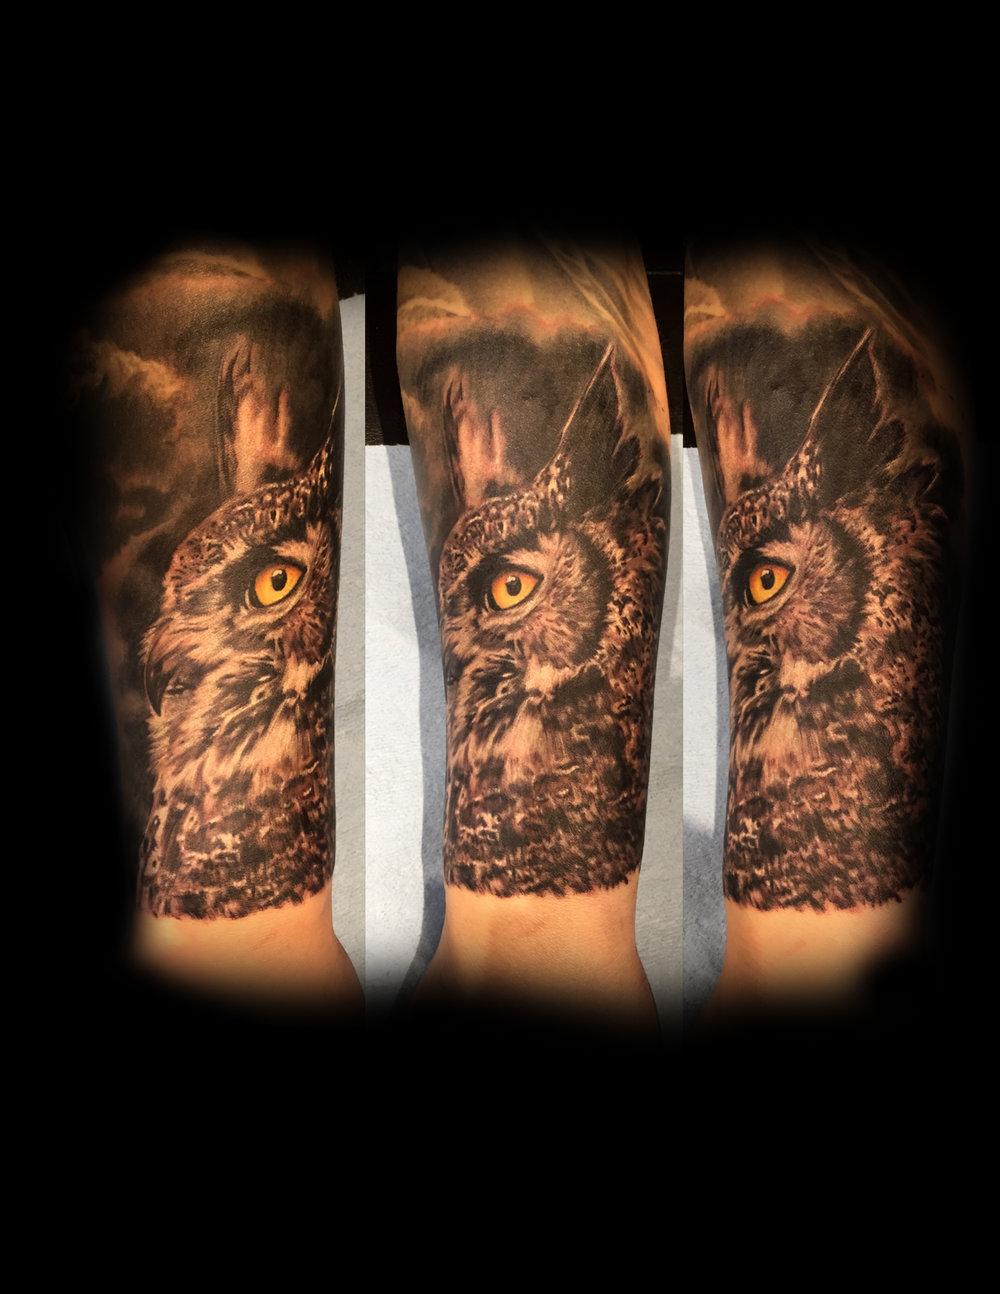 blk owl.jpg